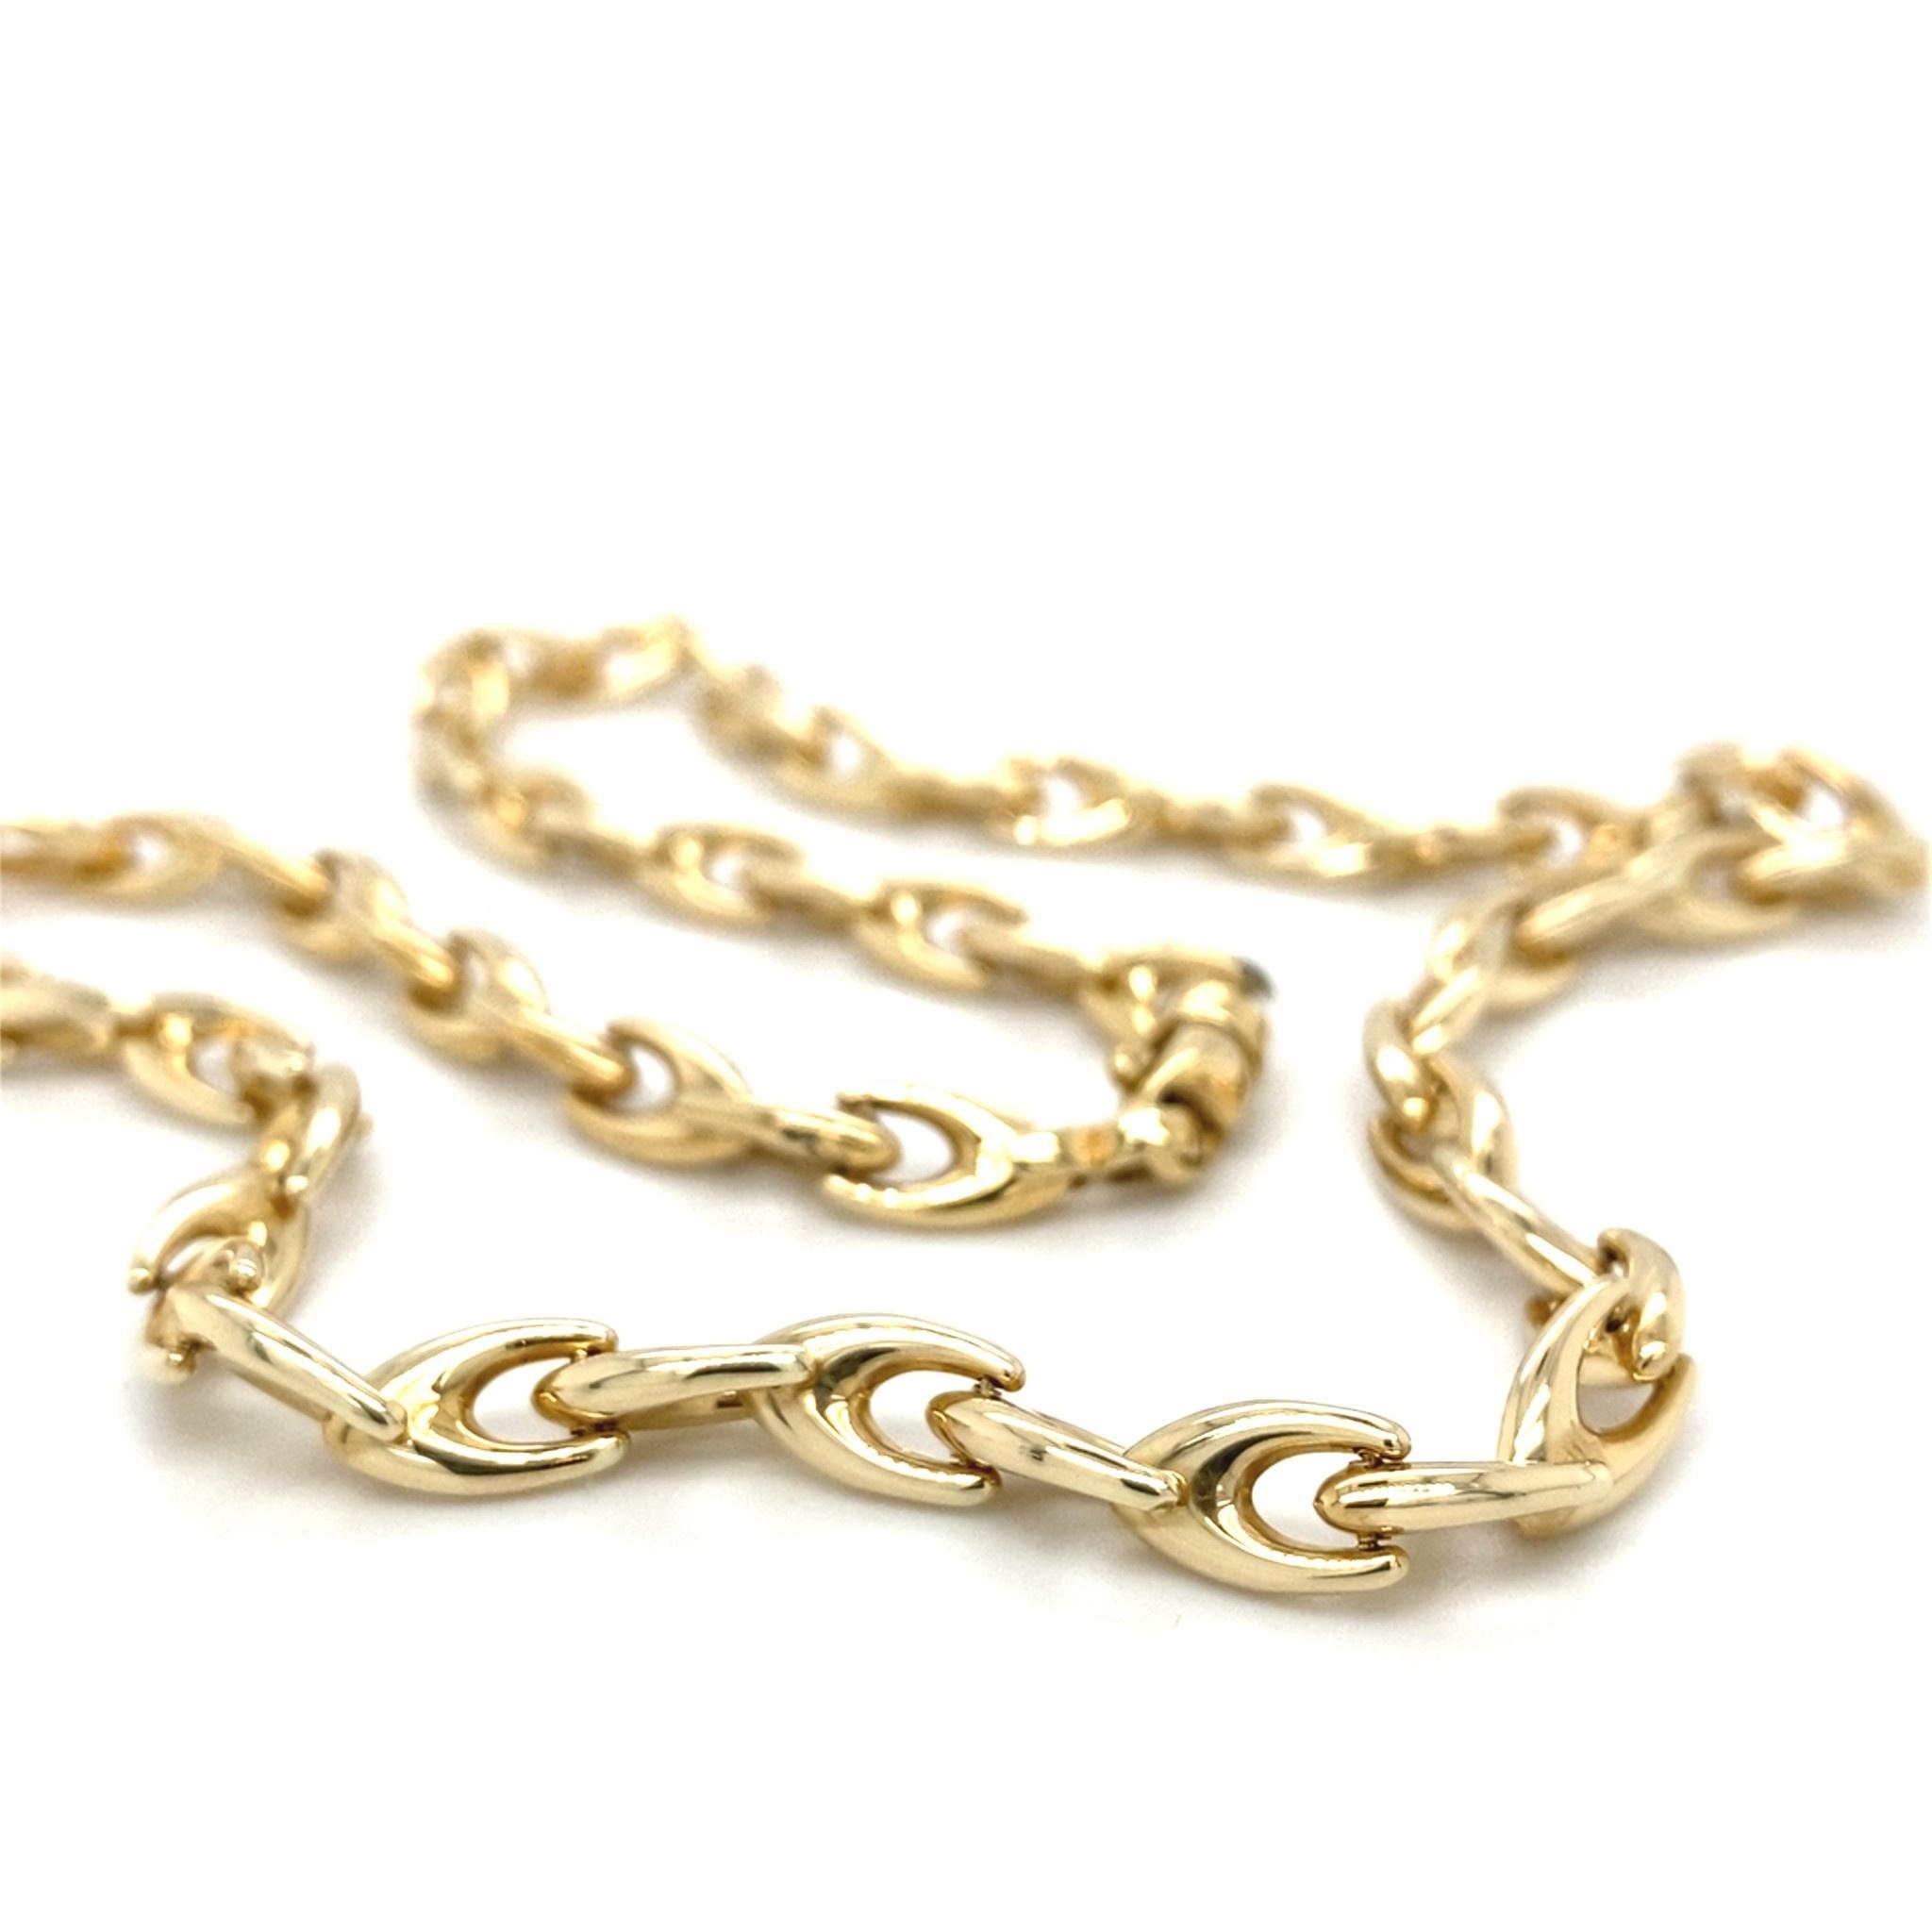 ROEMER ROEMER geelgouden fantasieschakel collier